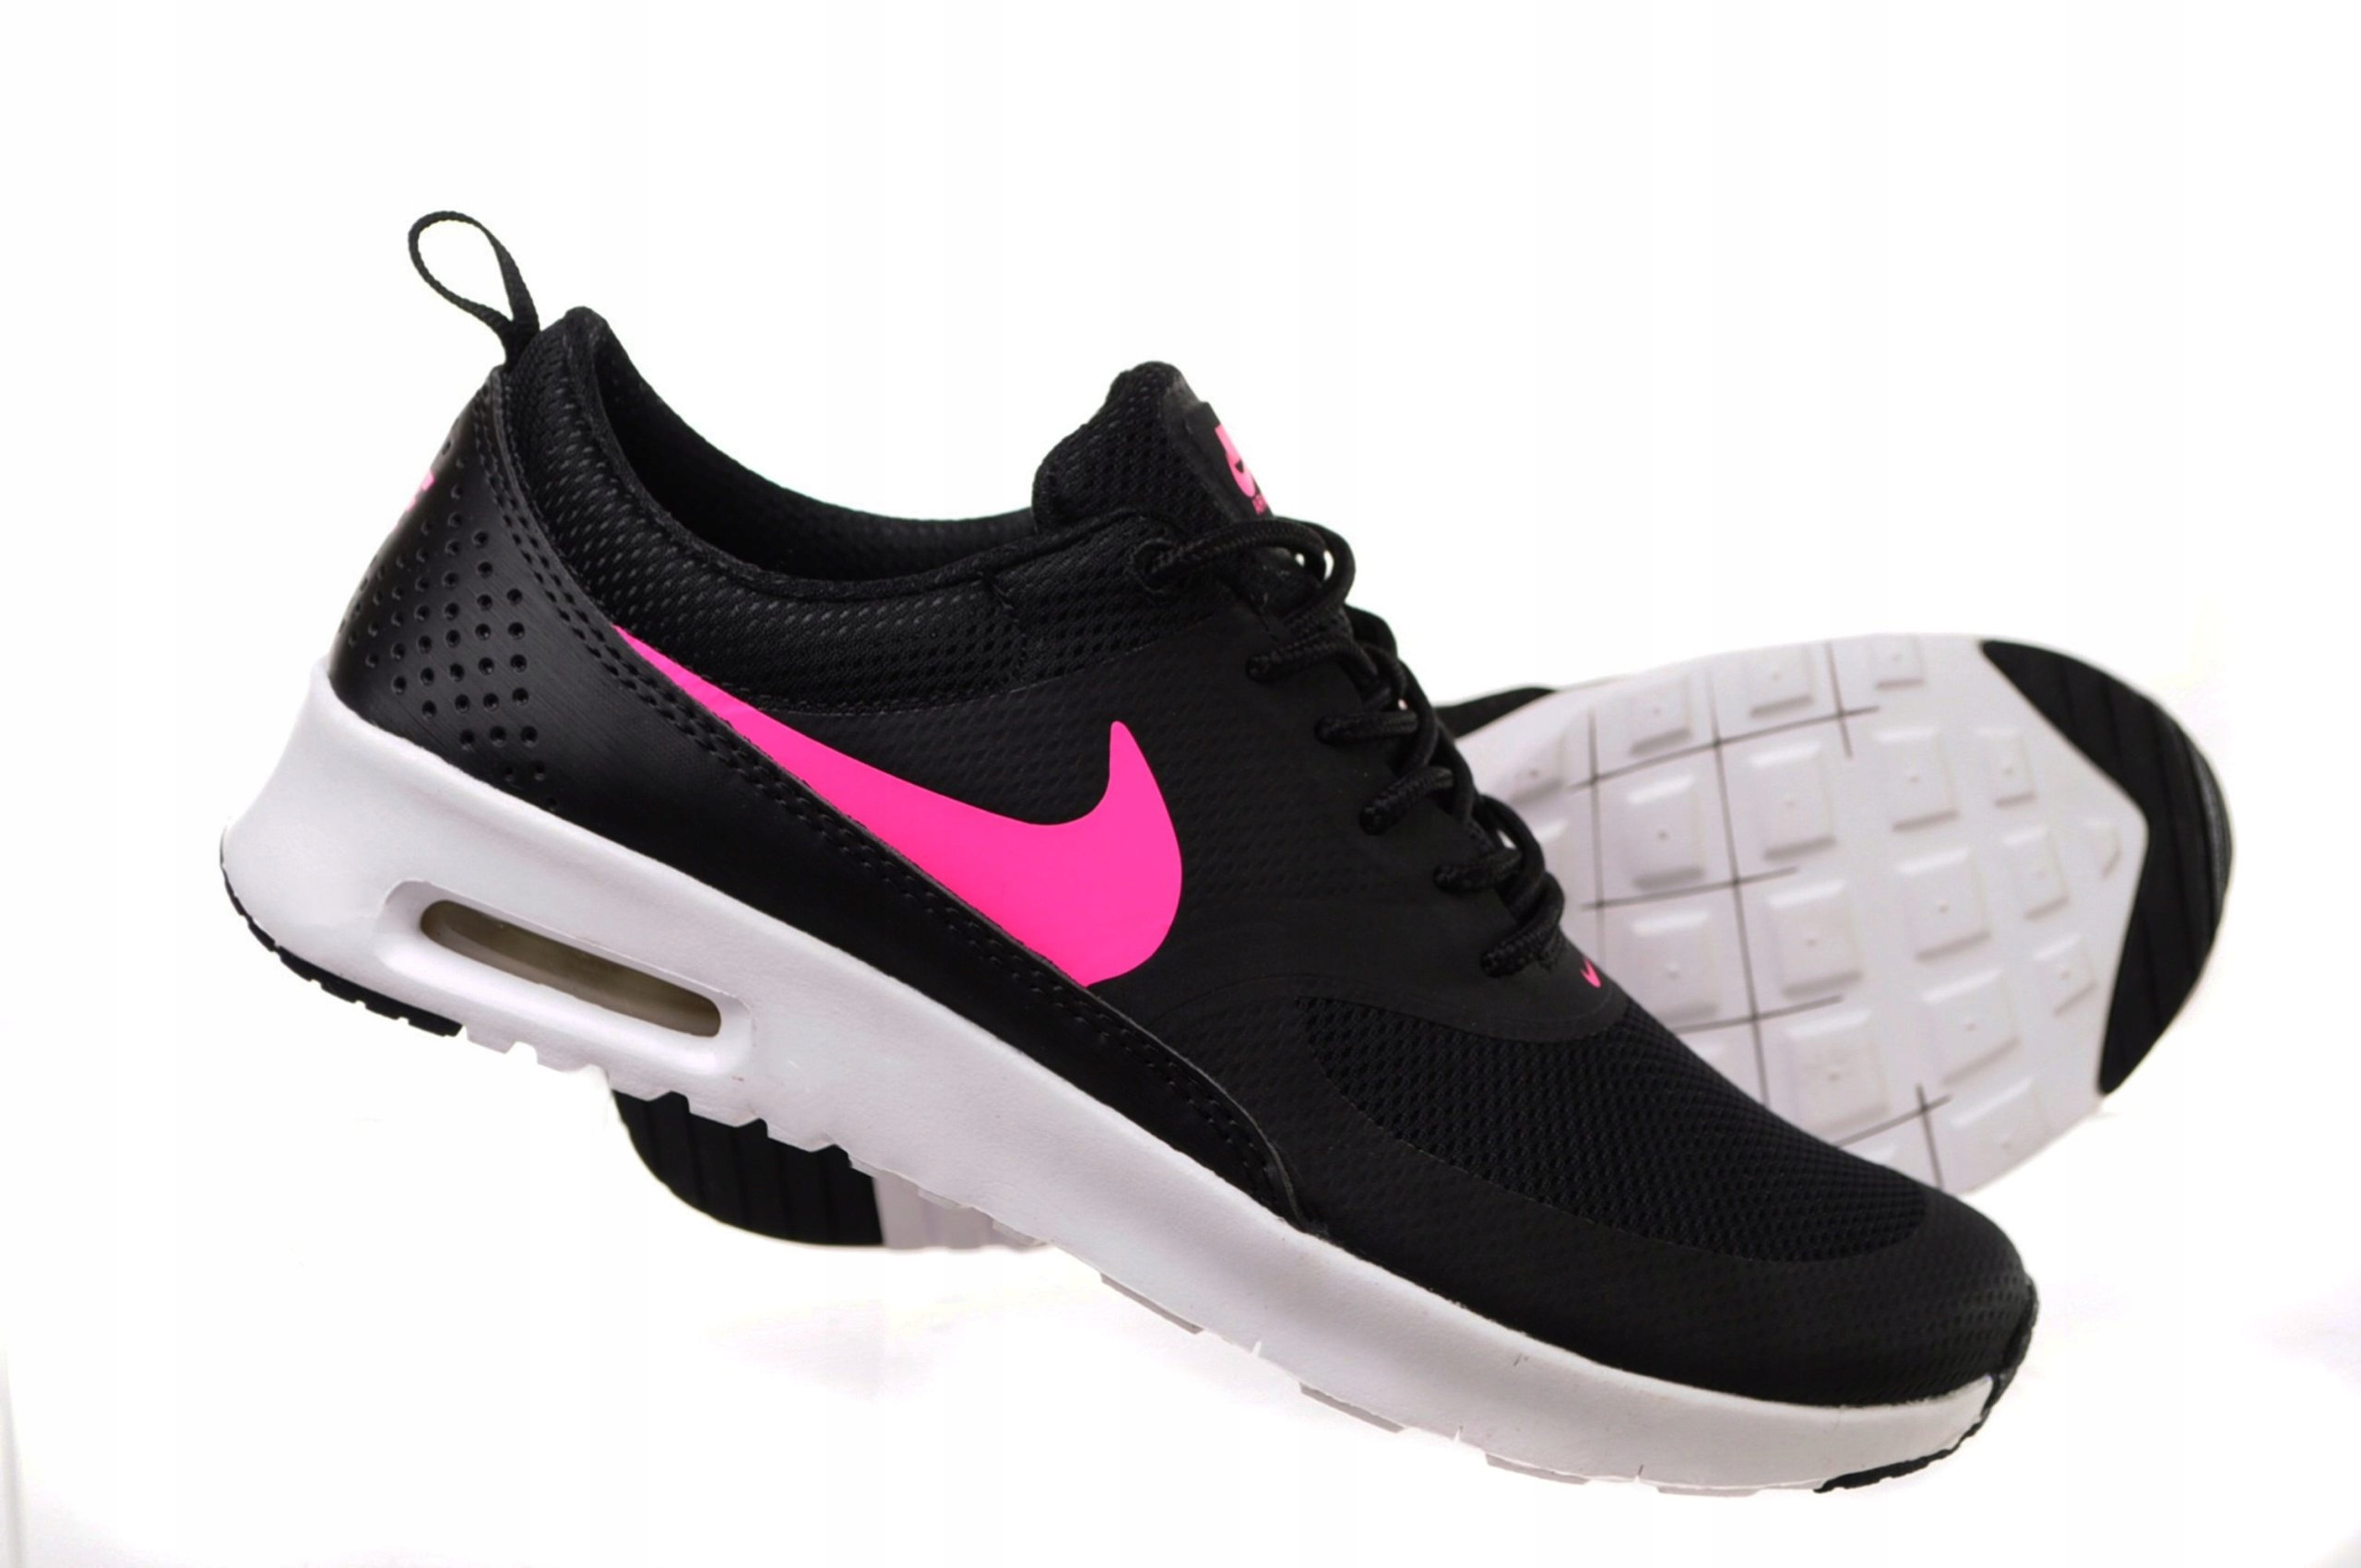 1ea1a2bee272ea Nike Air Max Thea Buty Damskie 814444 001 38 - 6834593254 ...